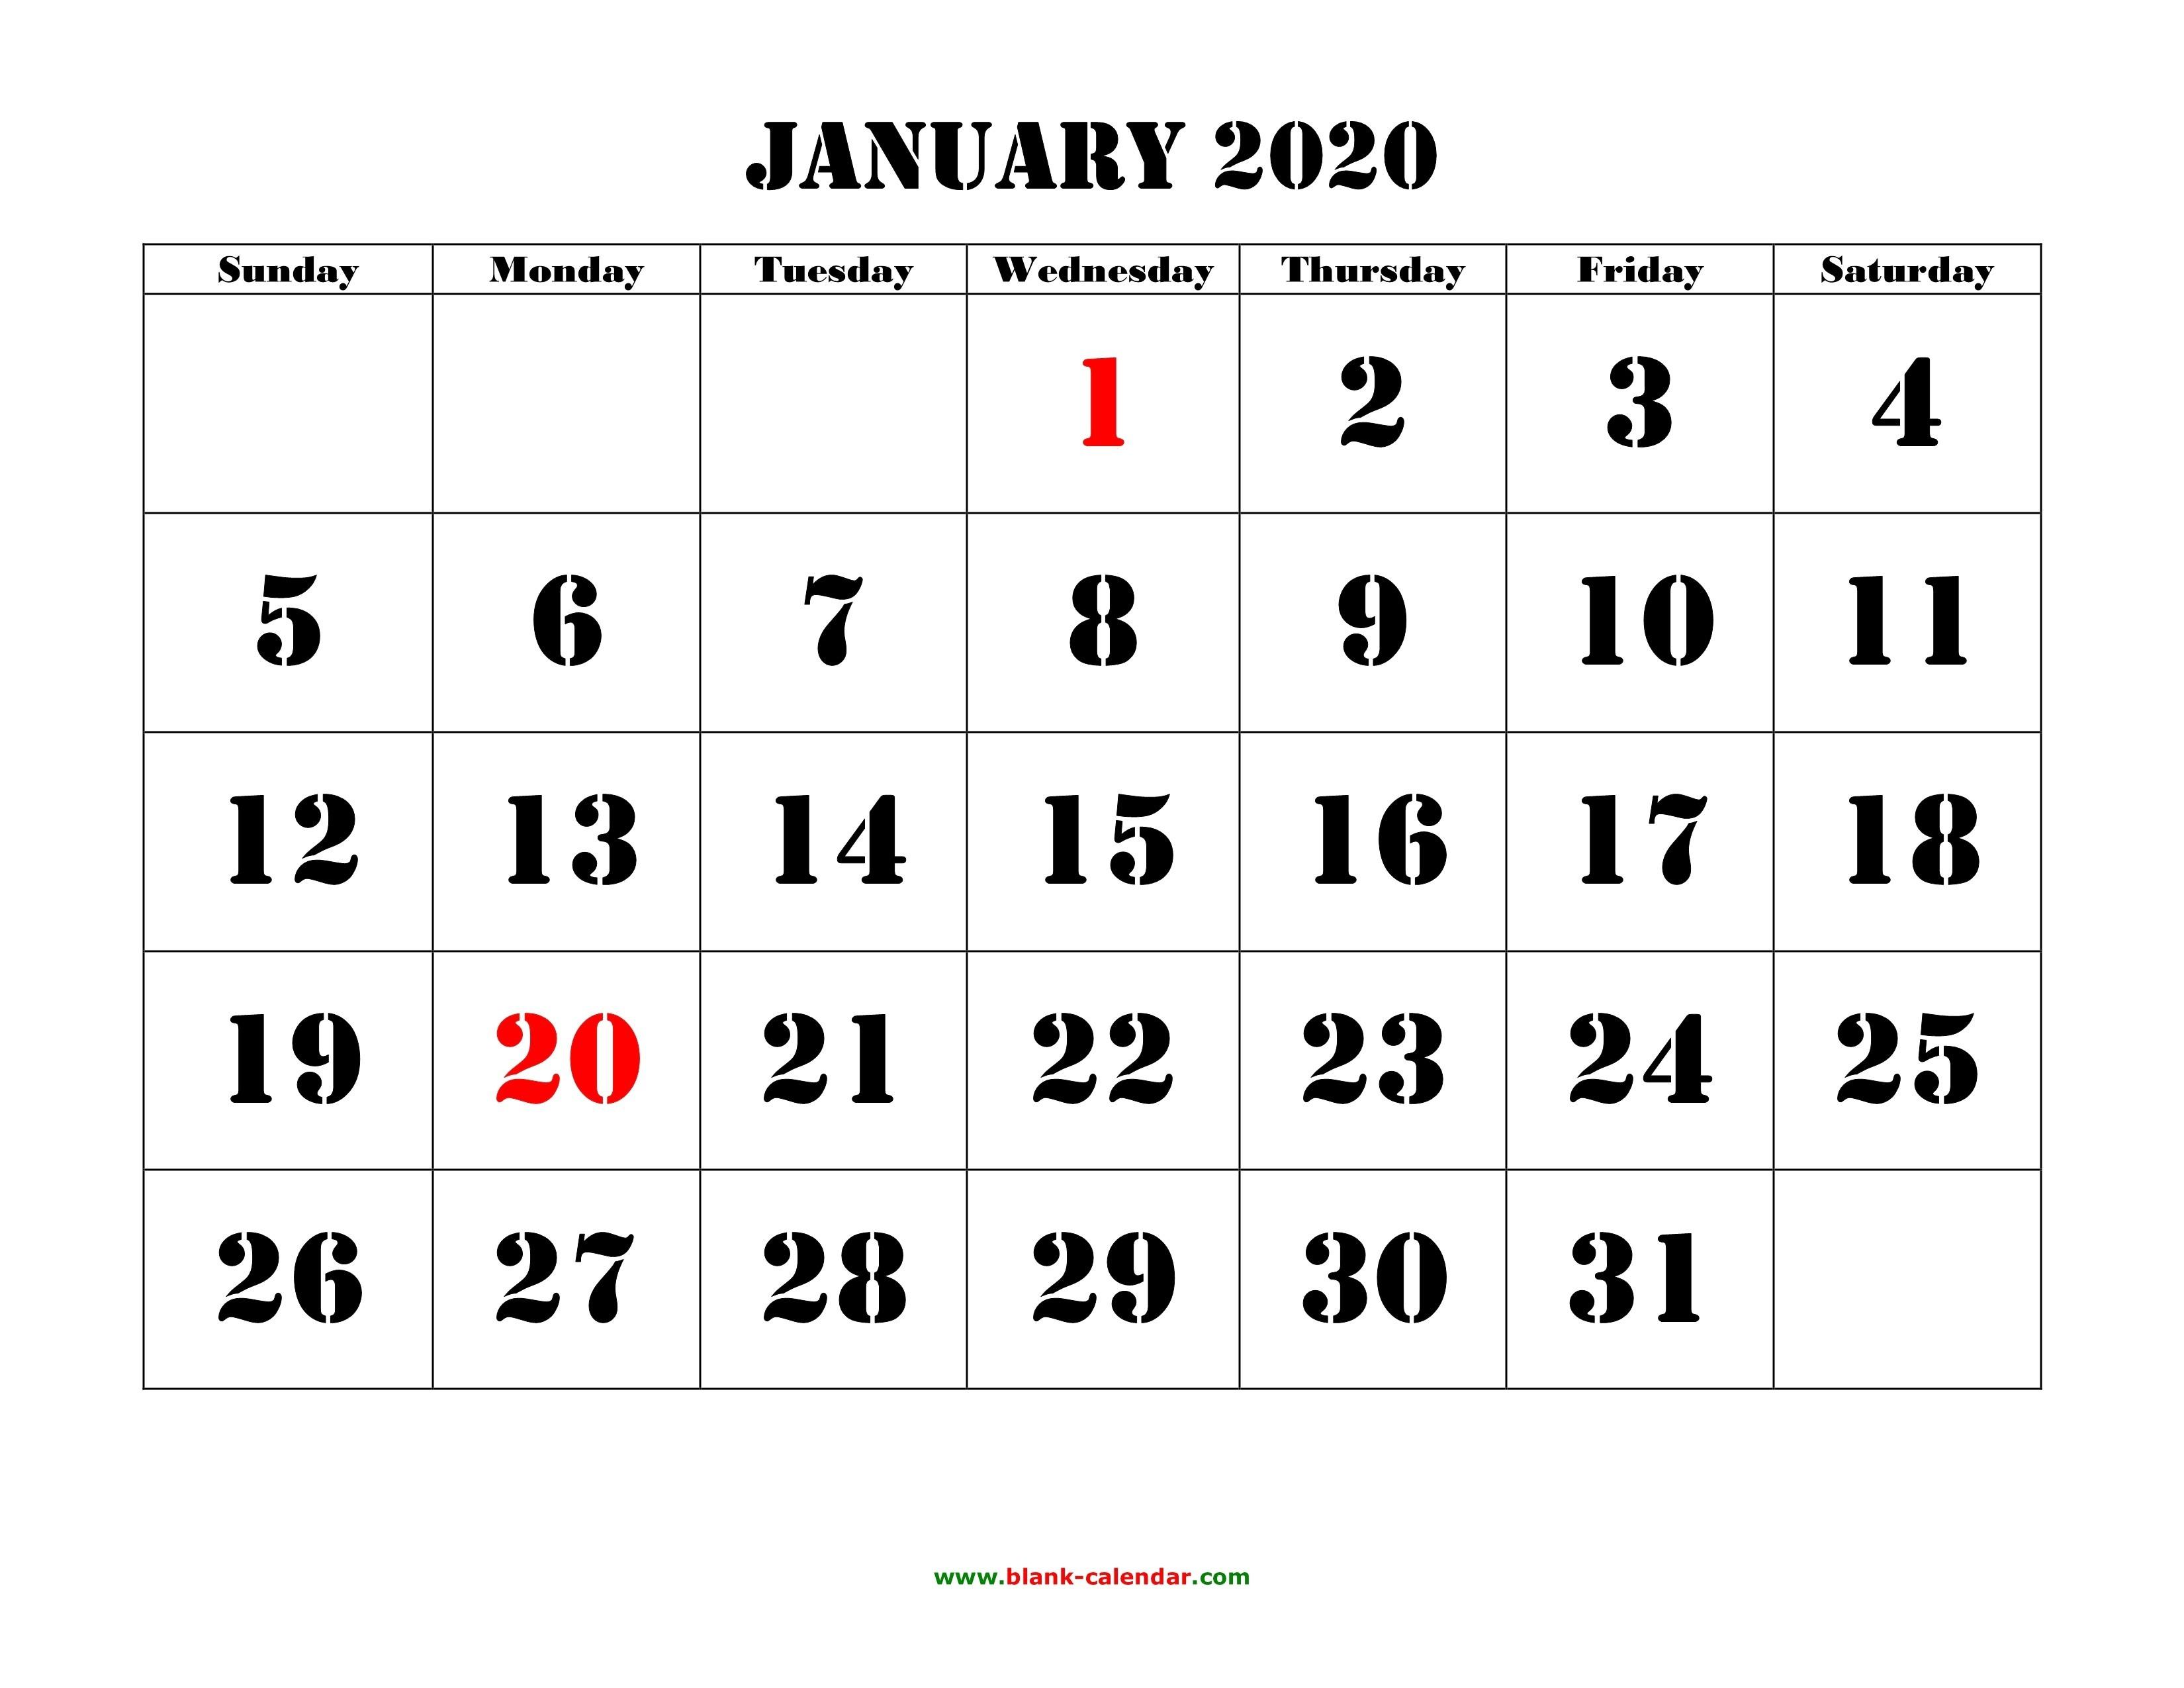 Printable January 2020 Calendar Large Font | Jcreview-Large January 2020 Calendar